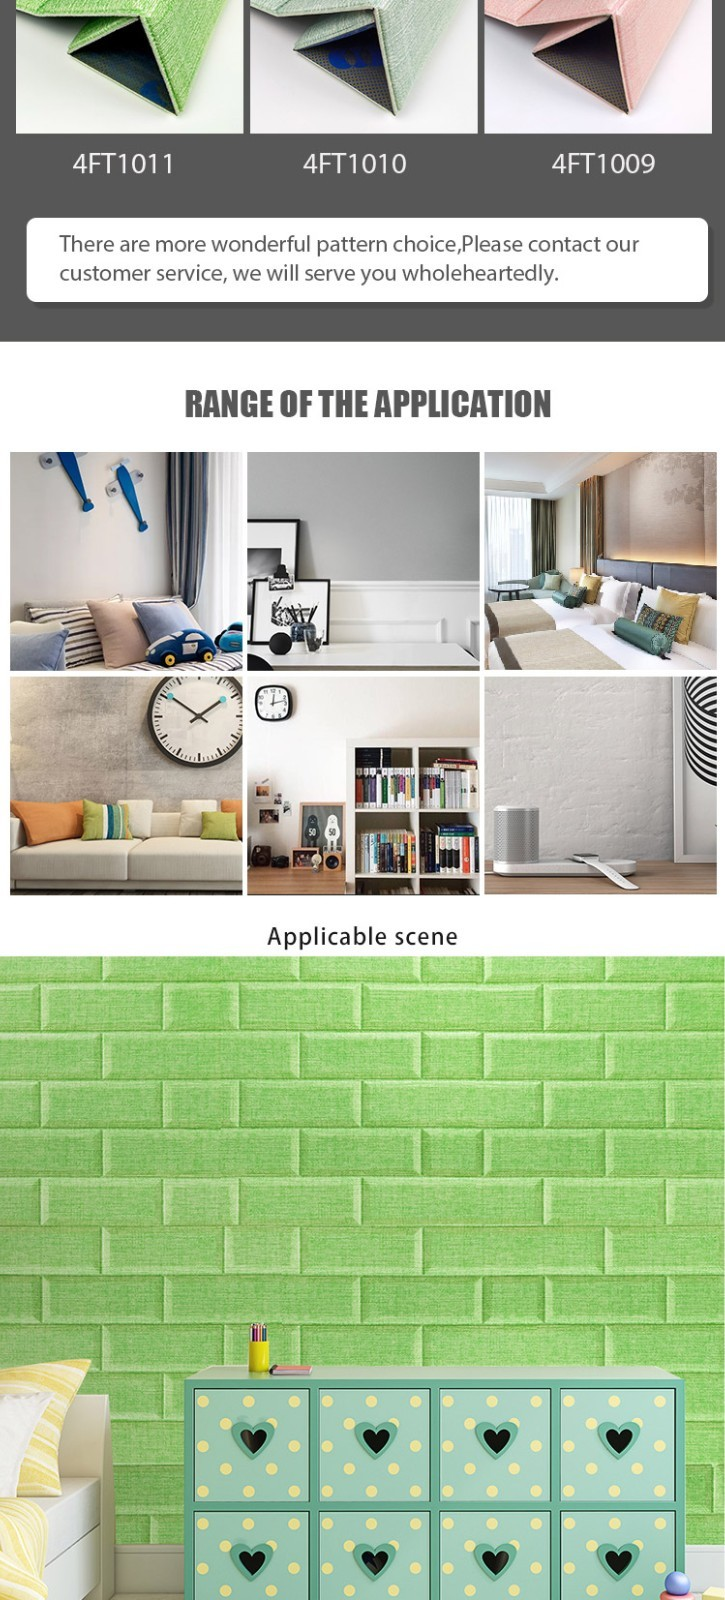 SUNYE best value foam ceiling tiles cheap best supplier for hotel